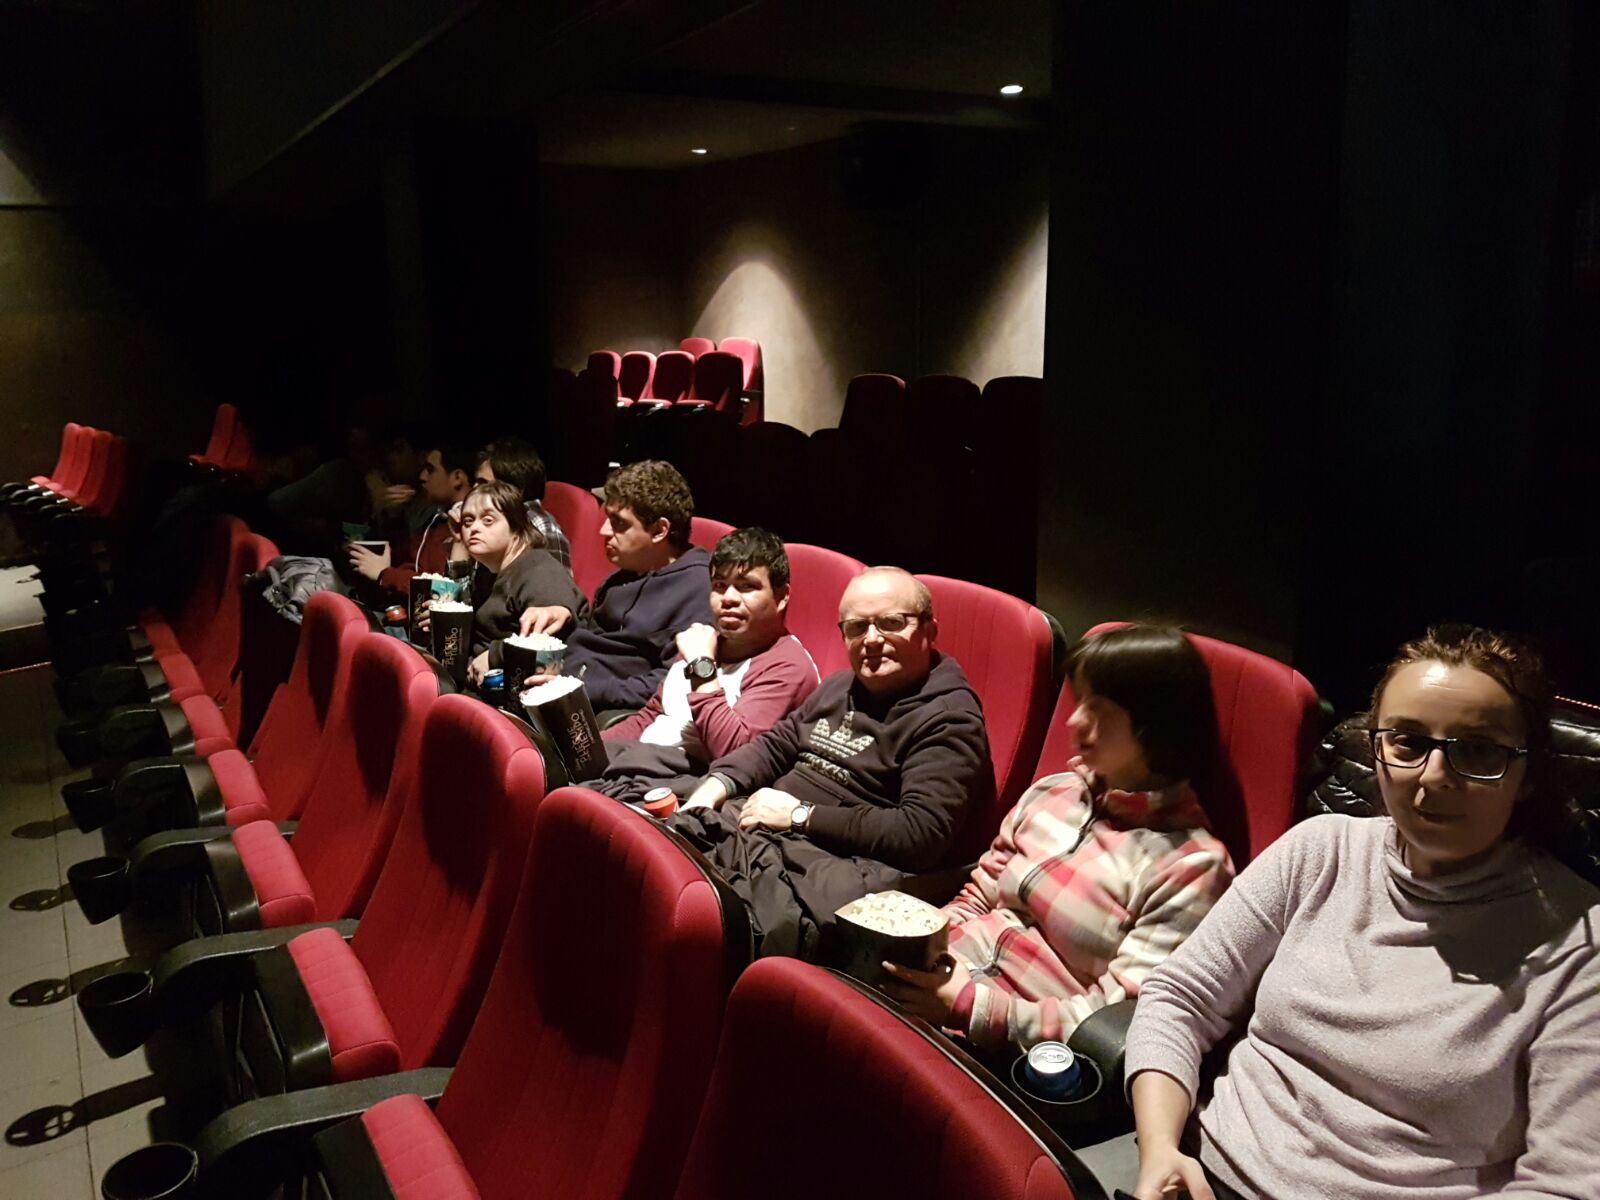 Al mal temps, cinema